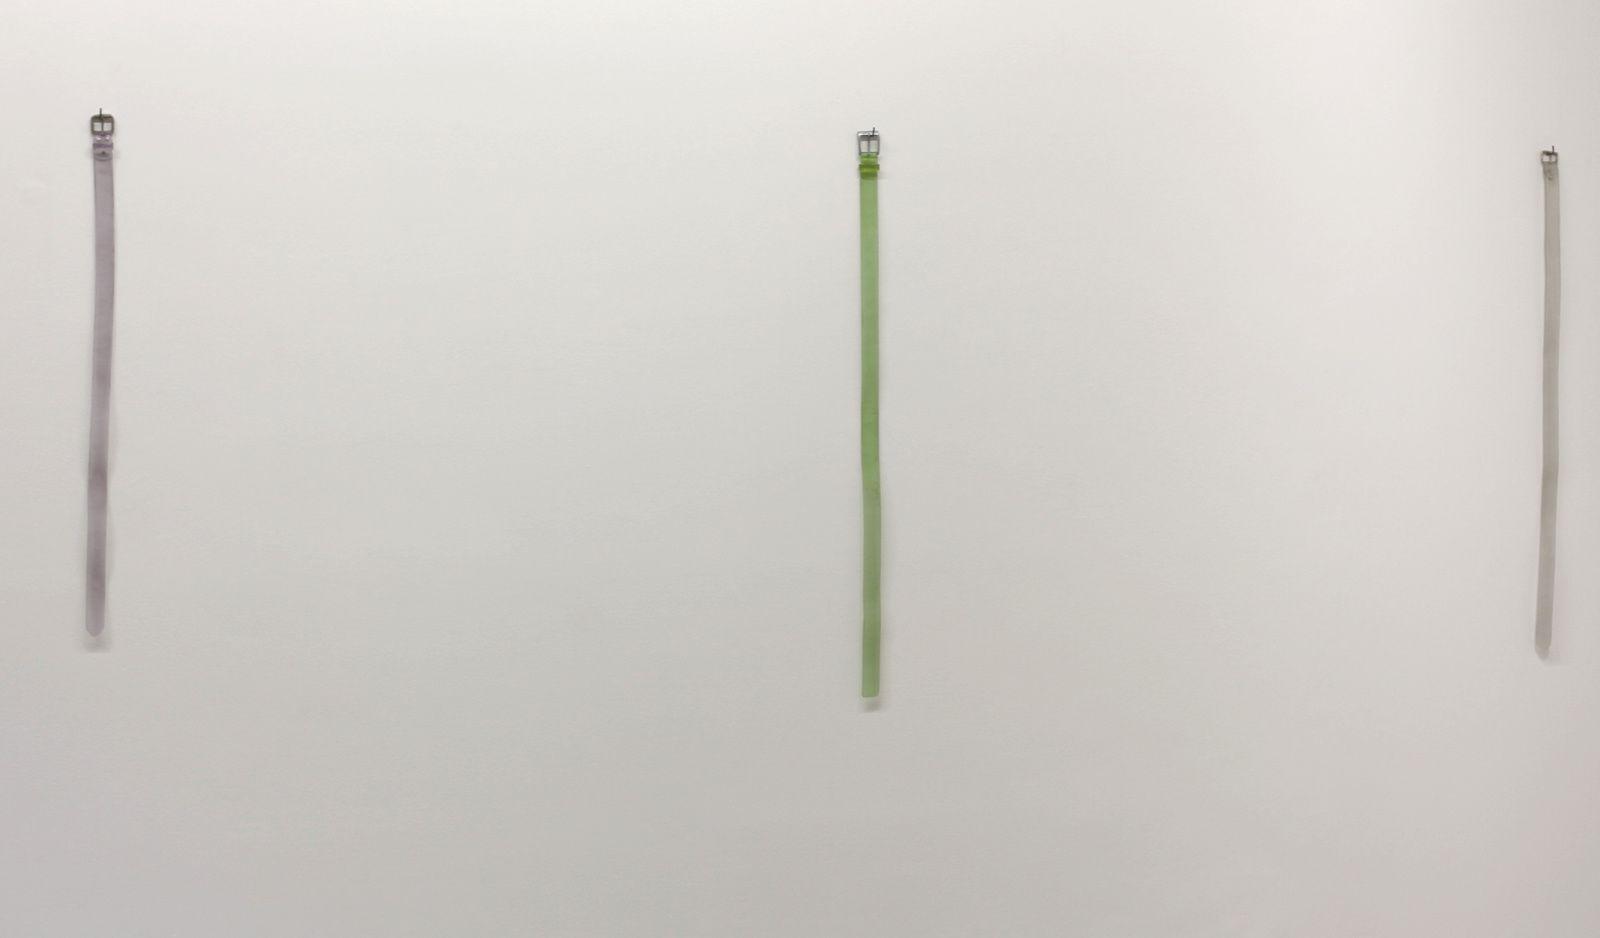 """Belt hanging on the wall"", 2014 de Valentin Carron Courtesy Galerie  Kamel Mennour © Photo Éric Simon"